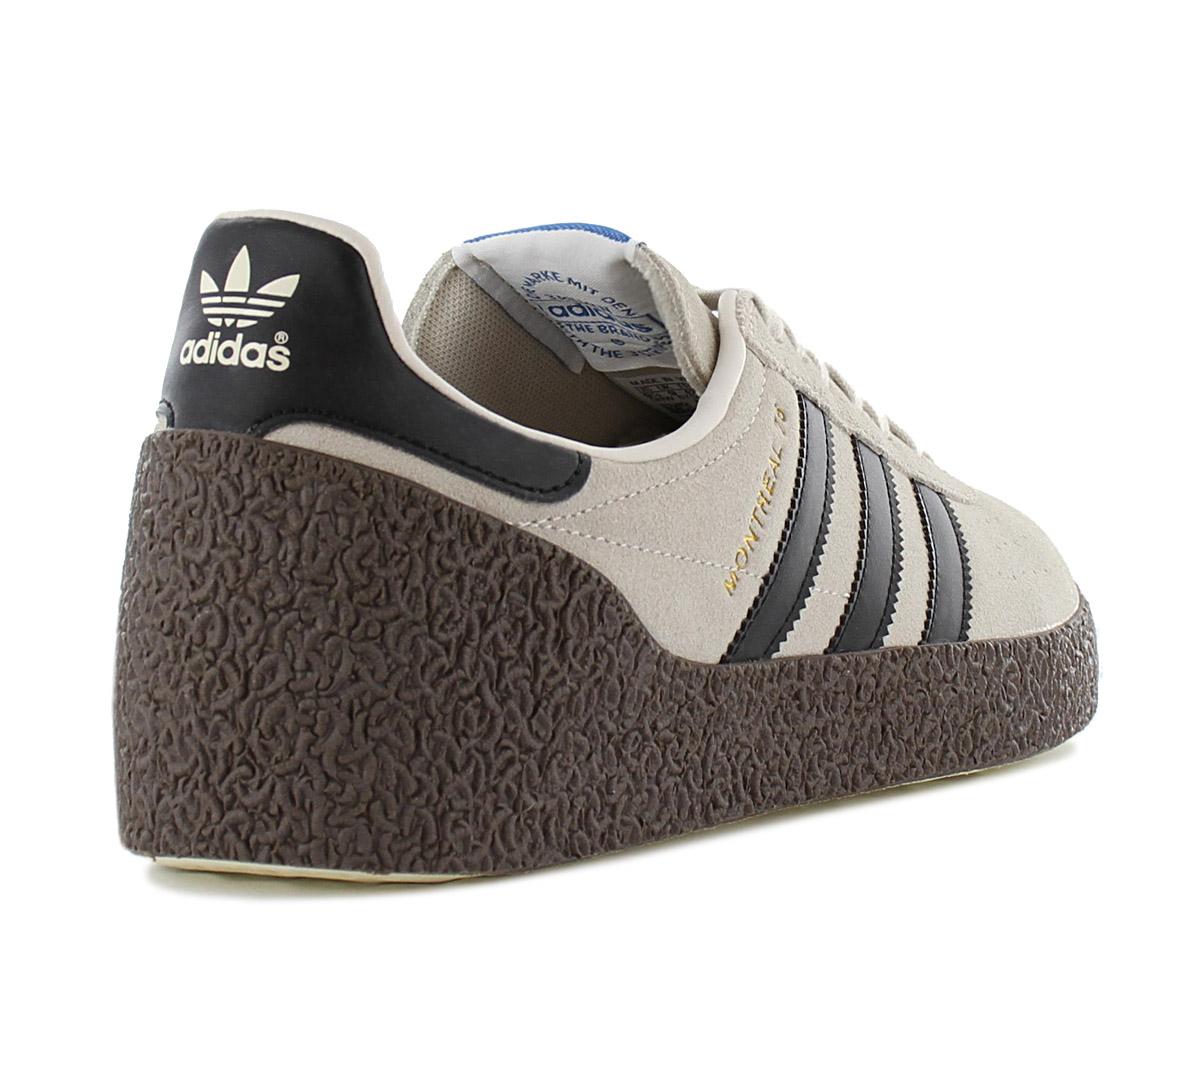 Details zu adidas Originals Montreal 76 Herren Sneaker B37915 Braun Schuhe Retro Turnschuhe